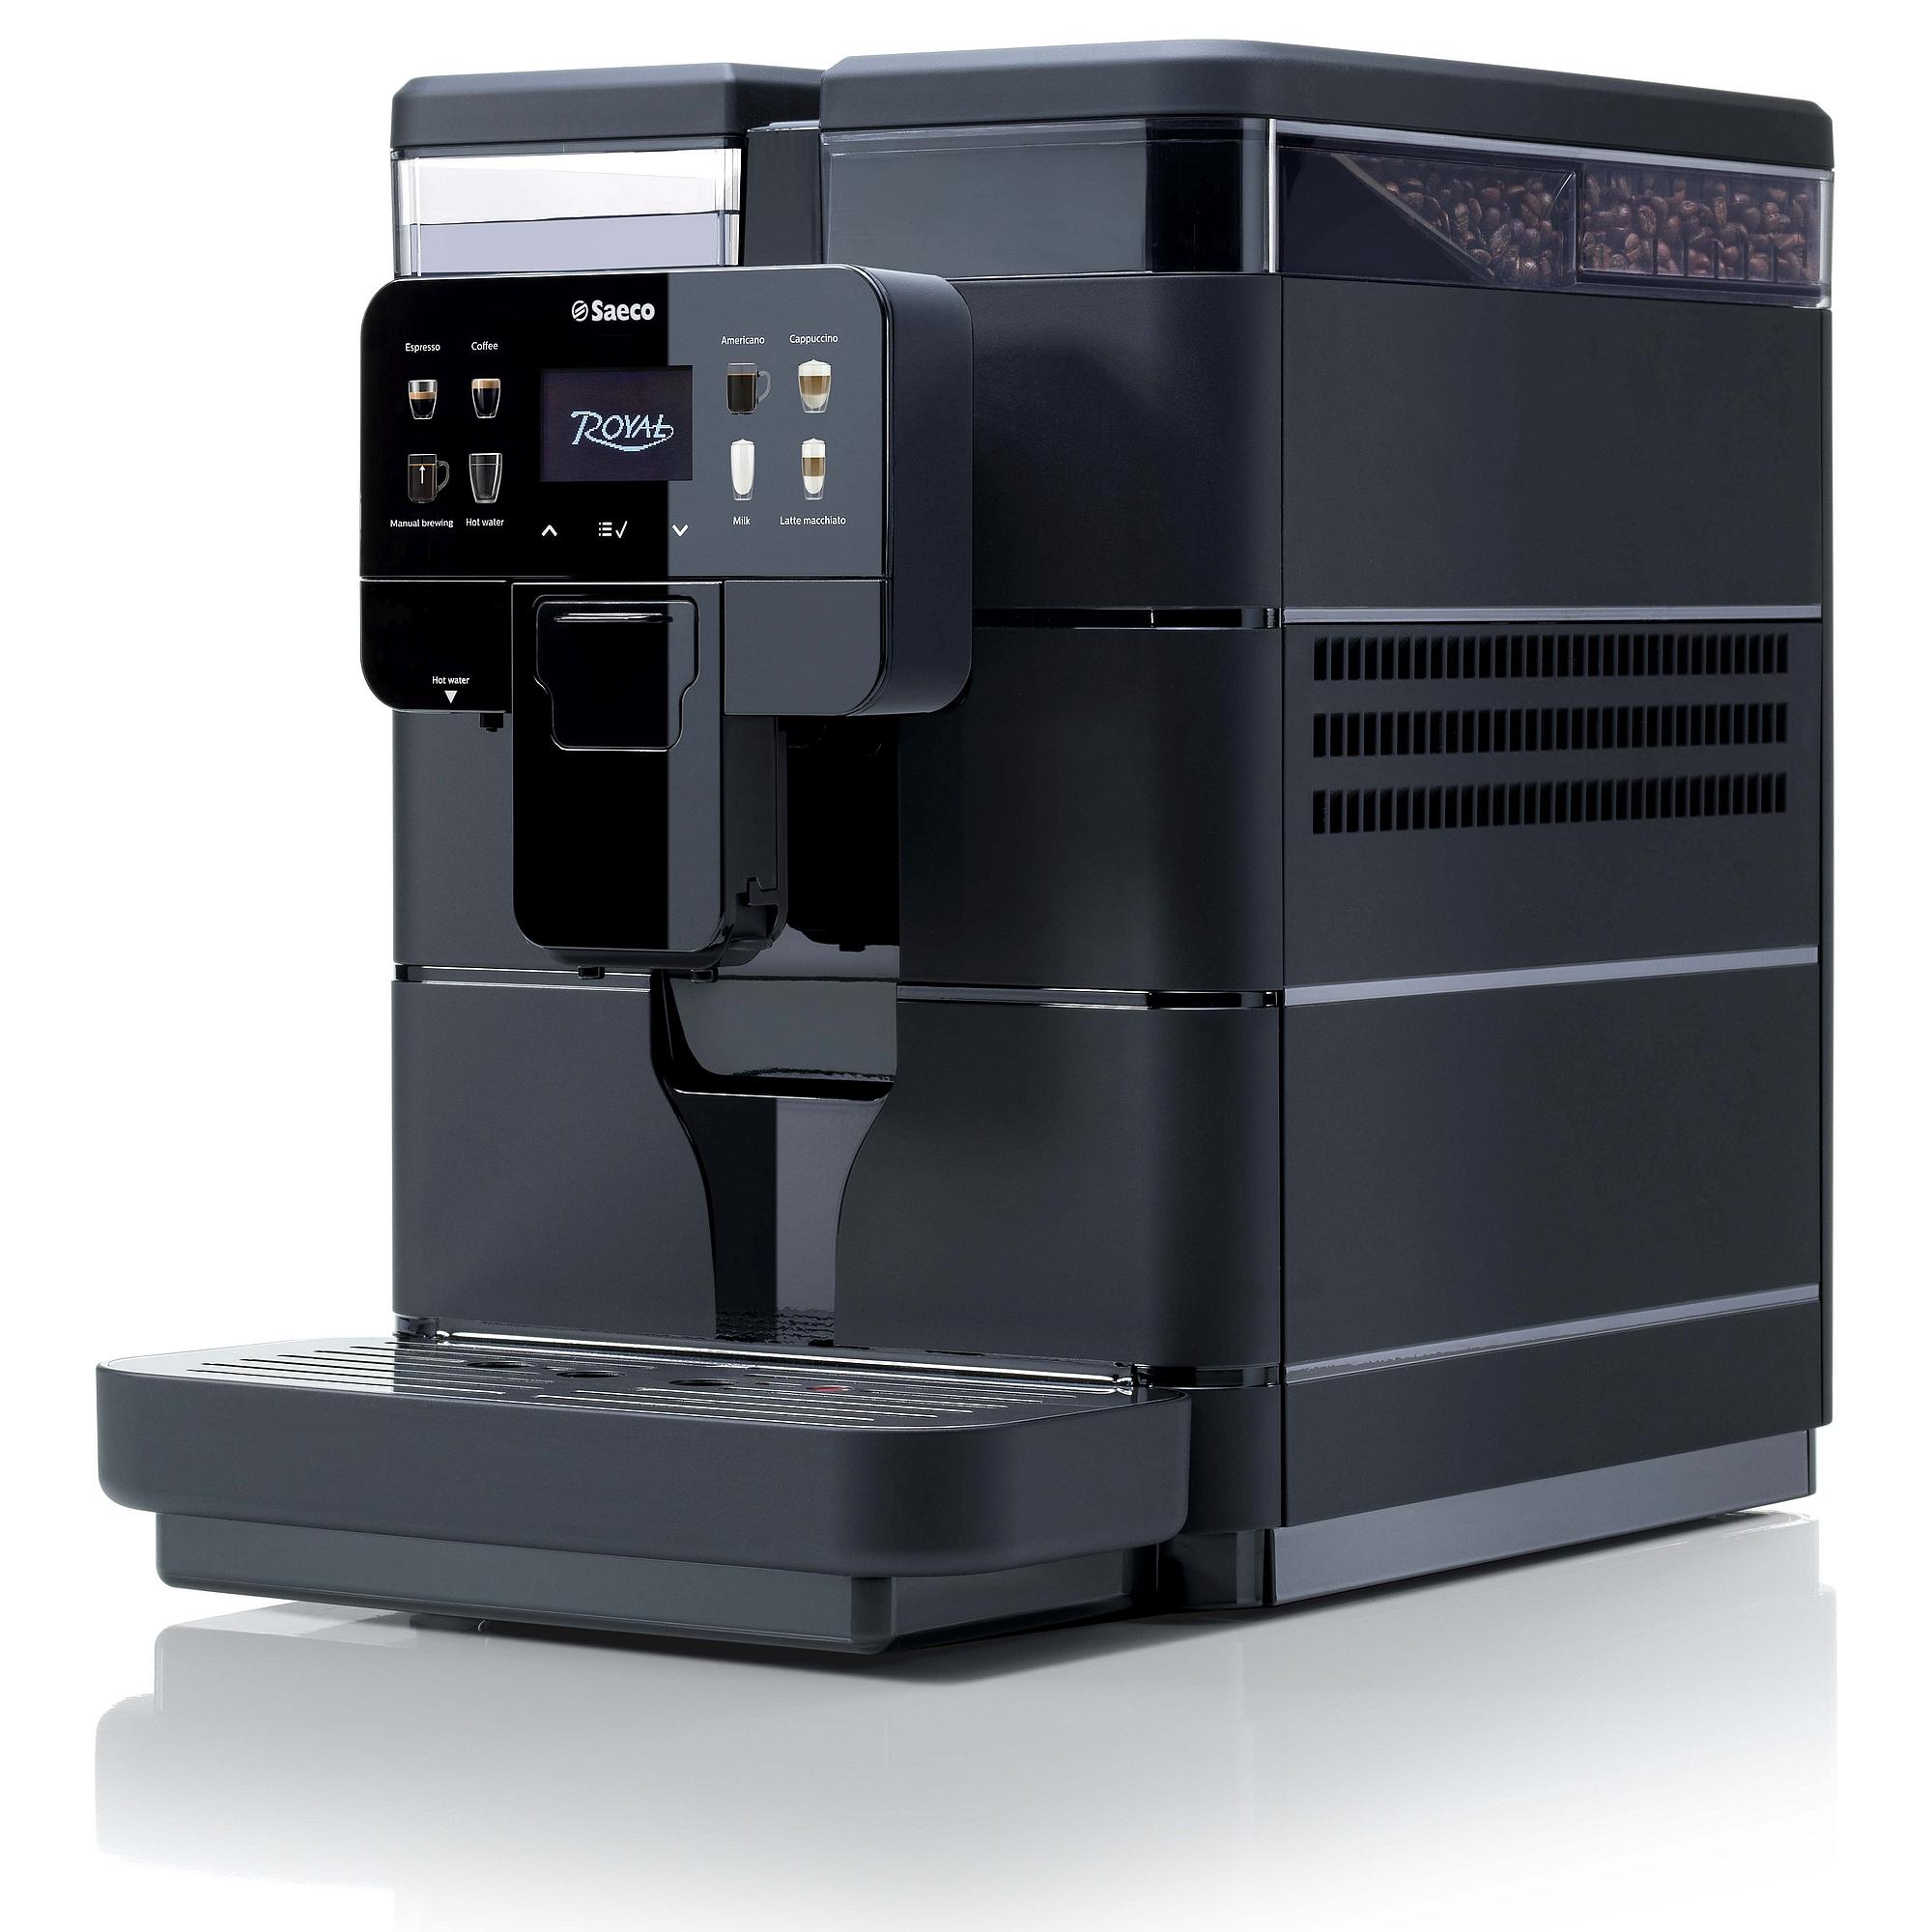 Saeco Royal Automatic Coffee Machine